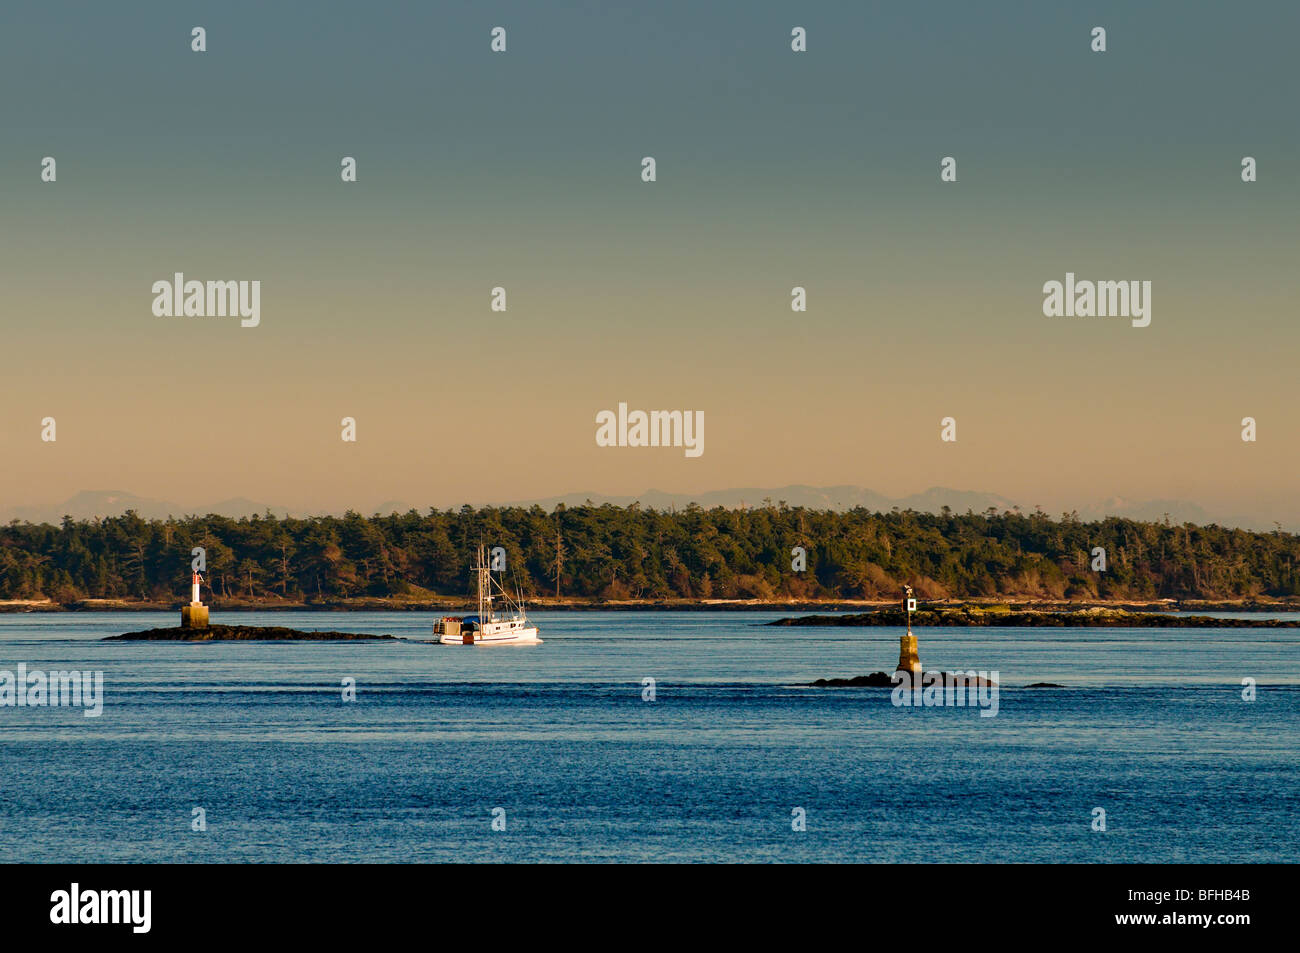 A fishing boat motors along between navigation markers off Oak Bay, Victoria BC. - Stock Image